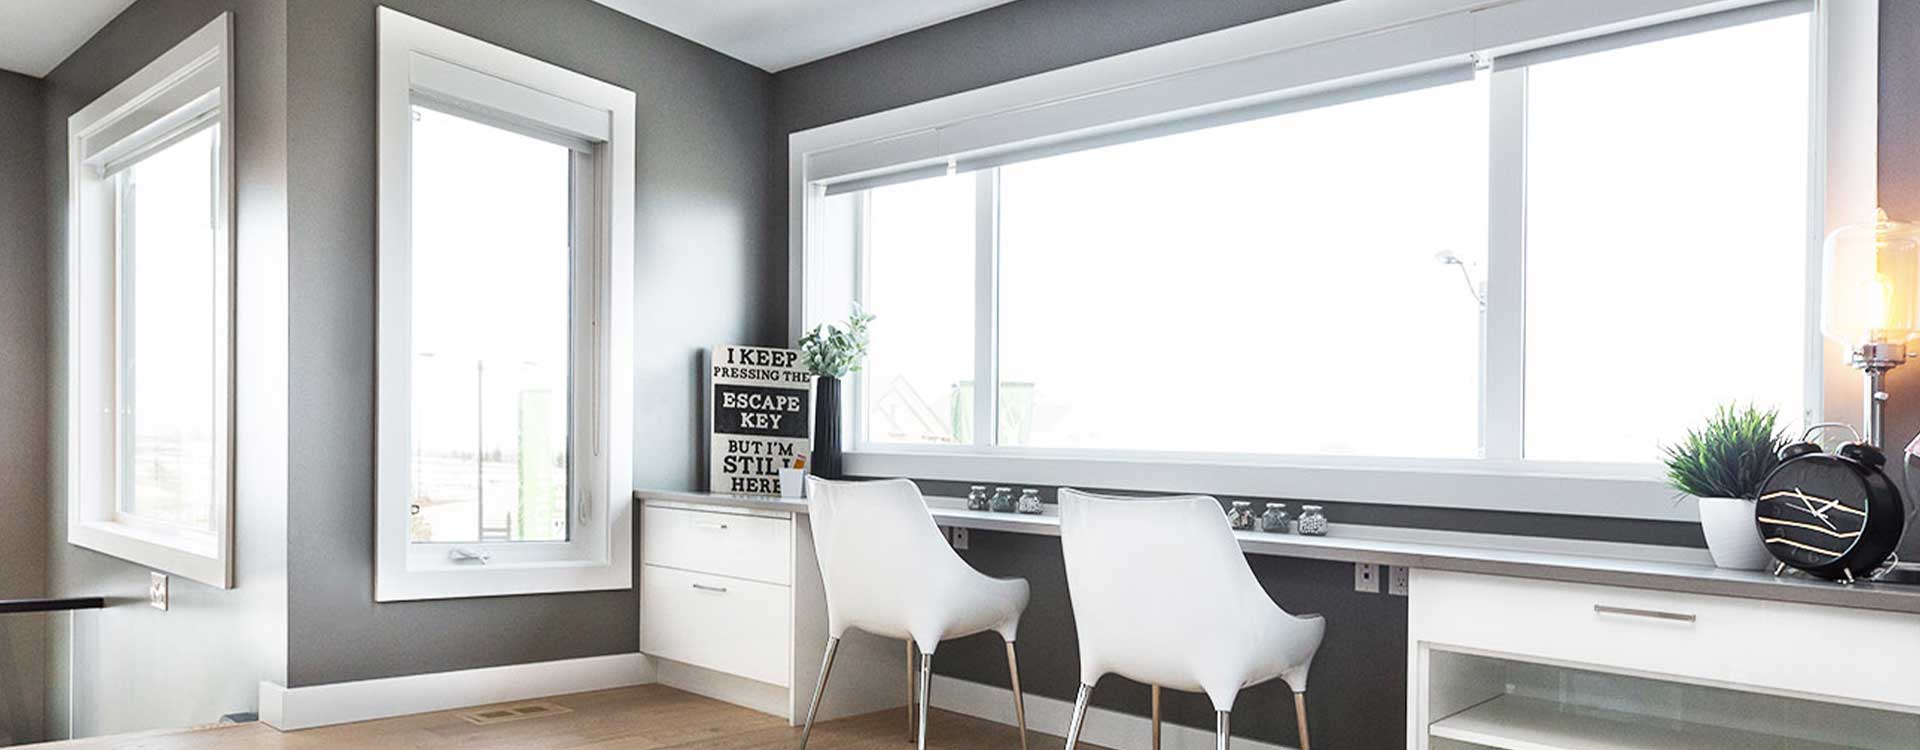 edmonton-home-builder-Kanvi-homes-windows